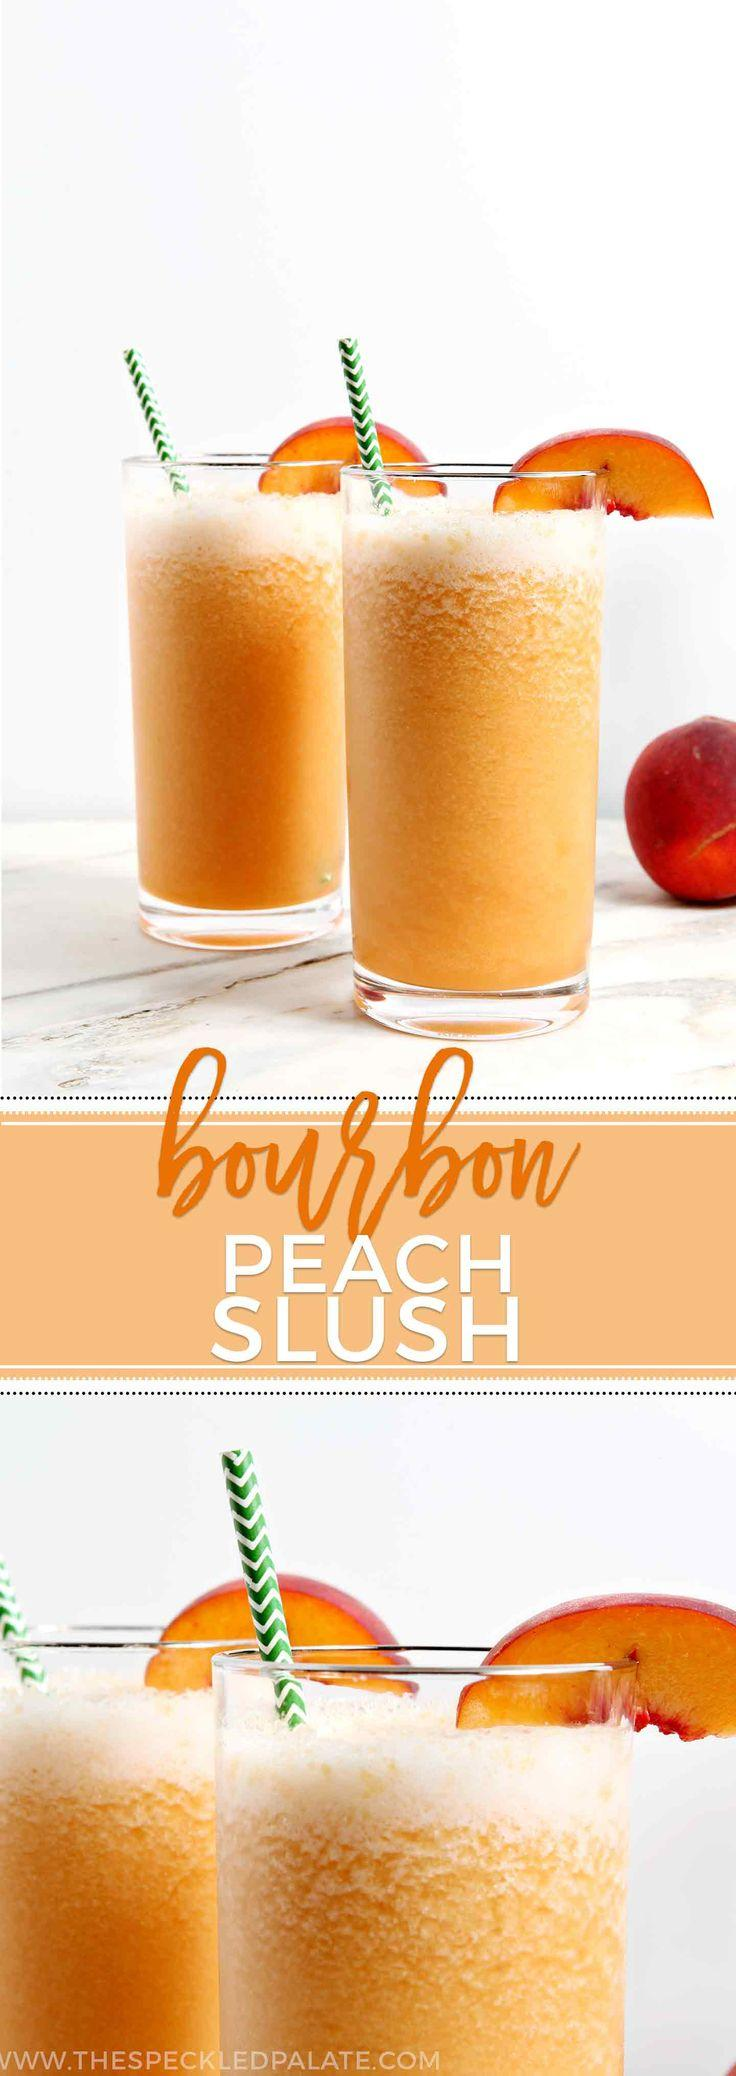 Wedding - Bourbon Peach Slush